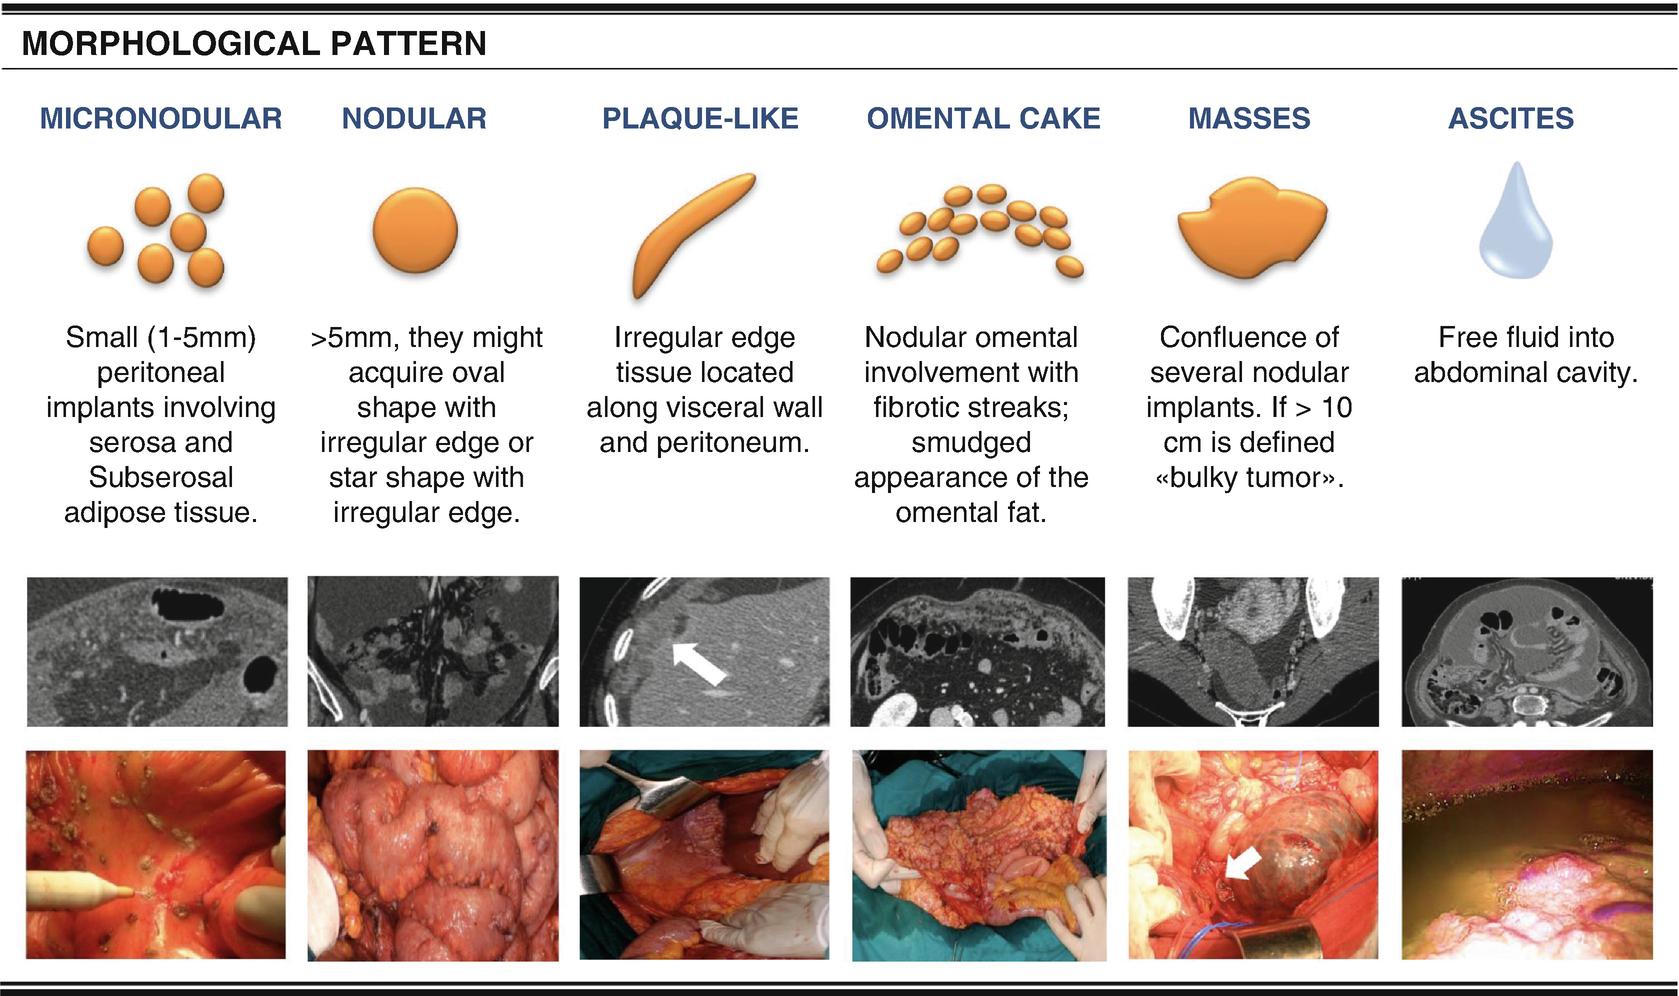 peritoneális rák md anderson